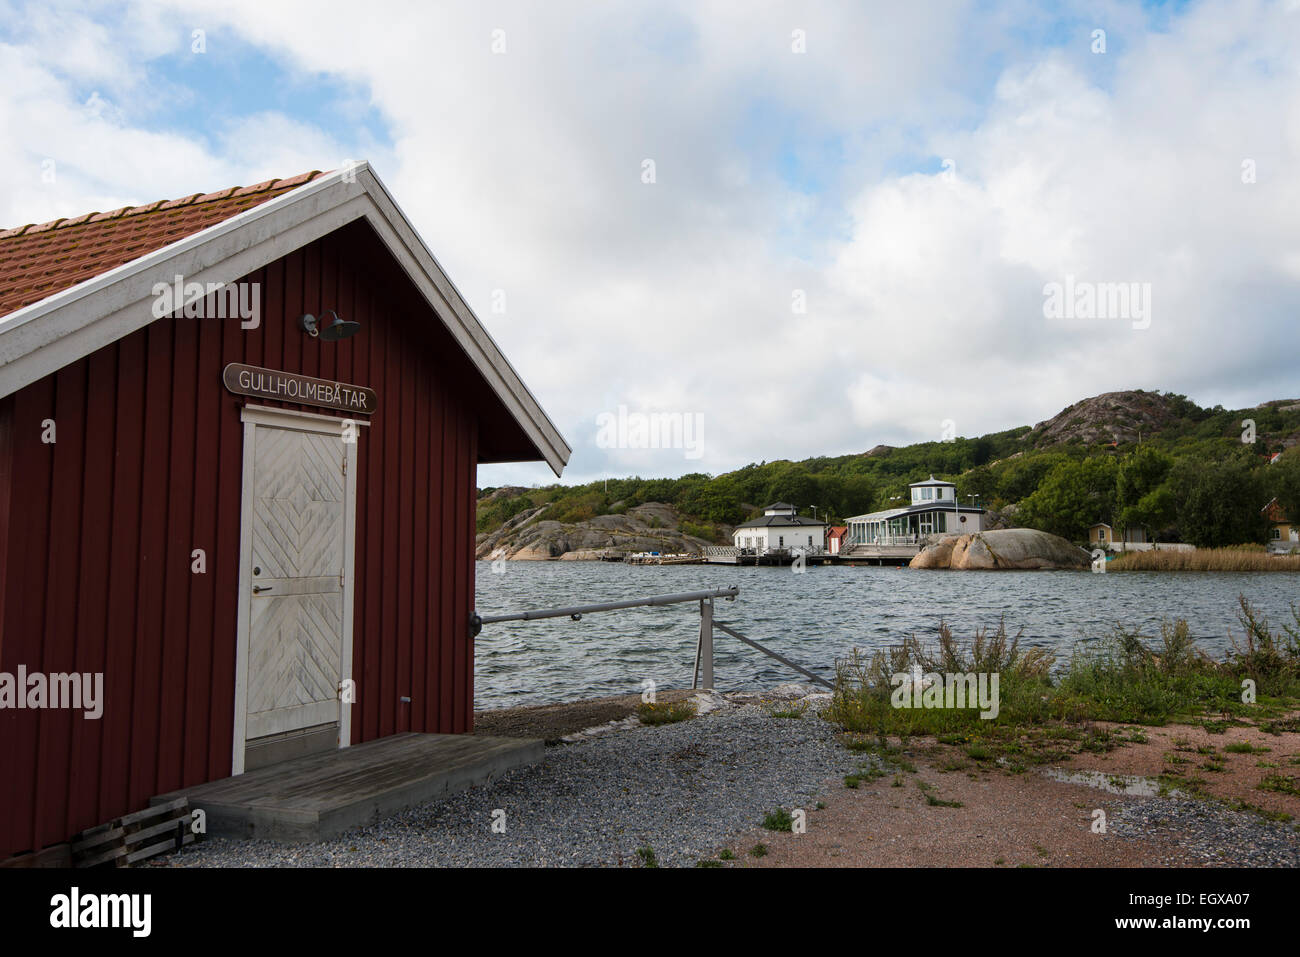 Boat house at island Orust, Västra Götalands län, Bohuslän, Västra Götalands län, - Stock Image